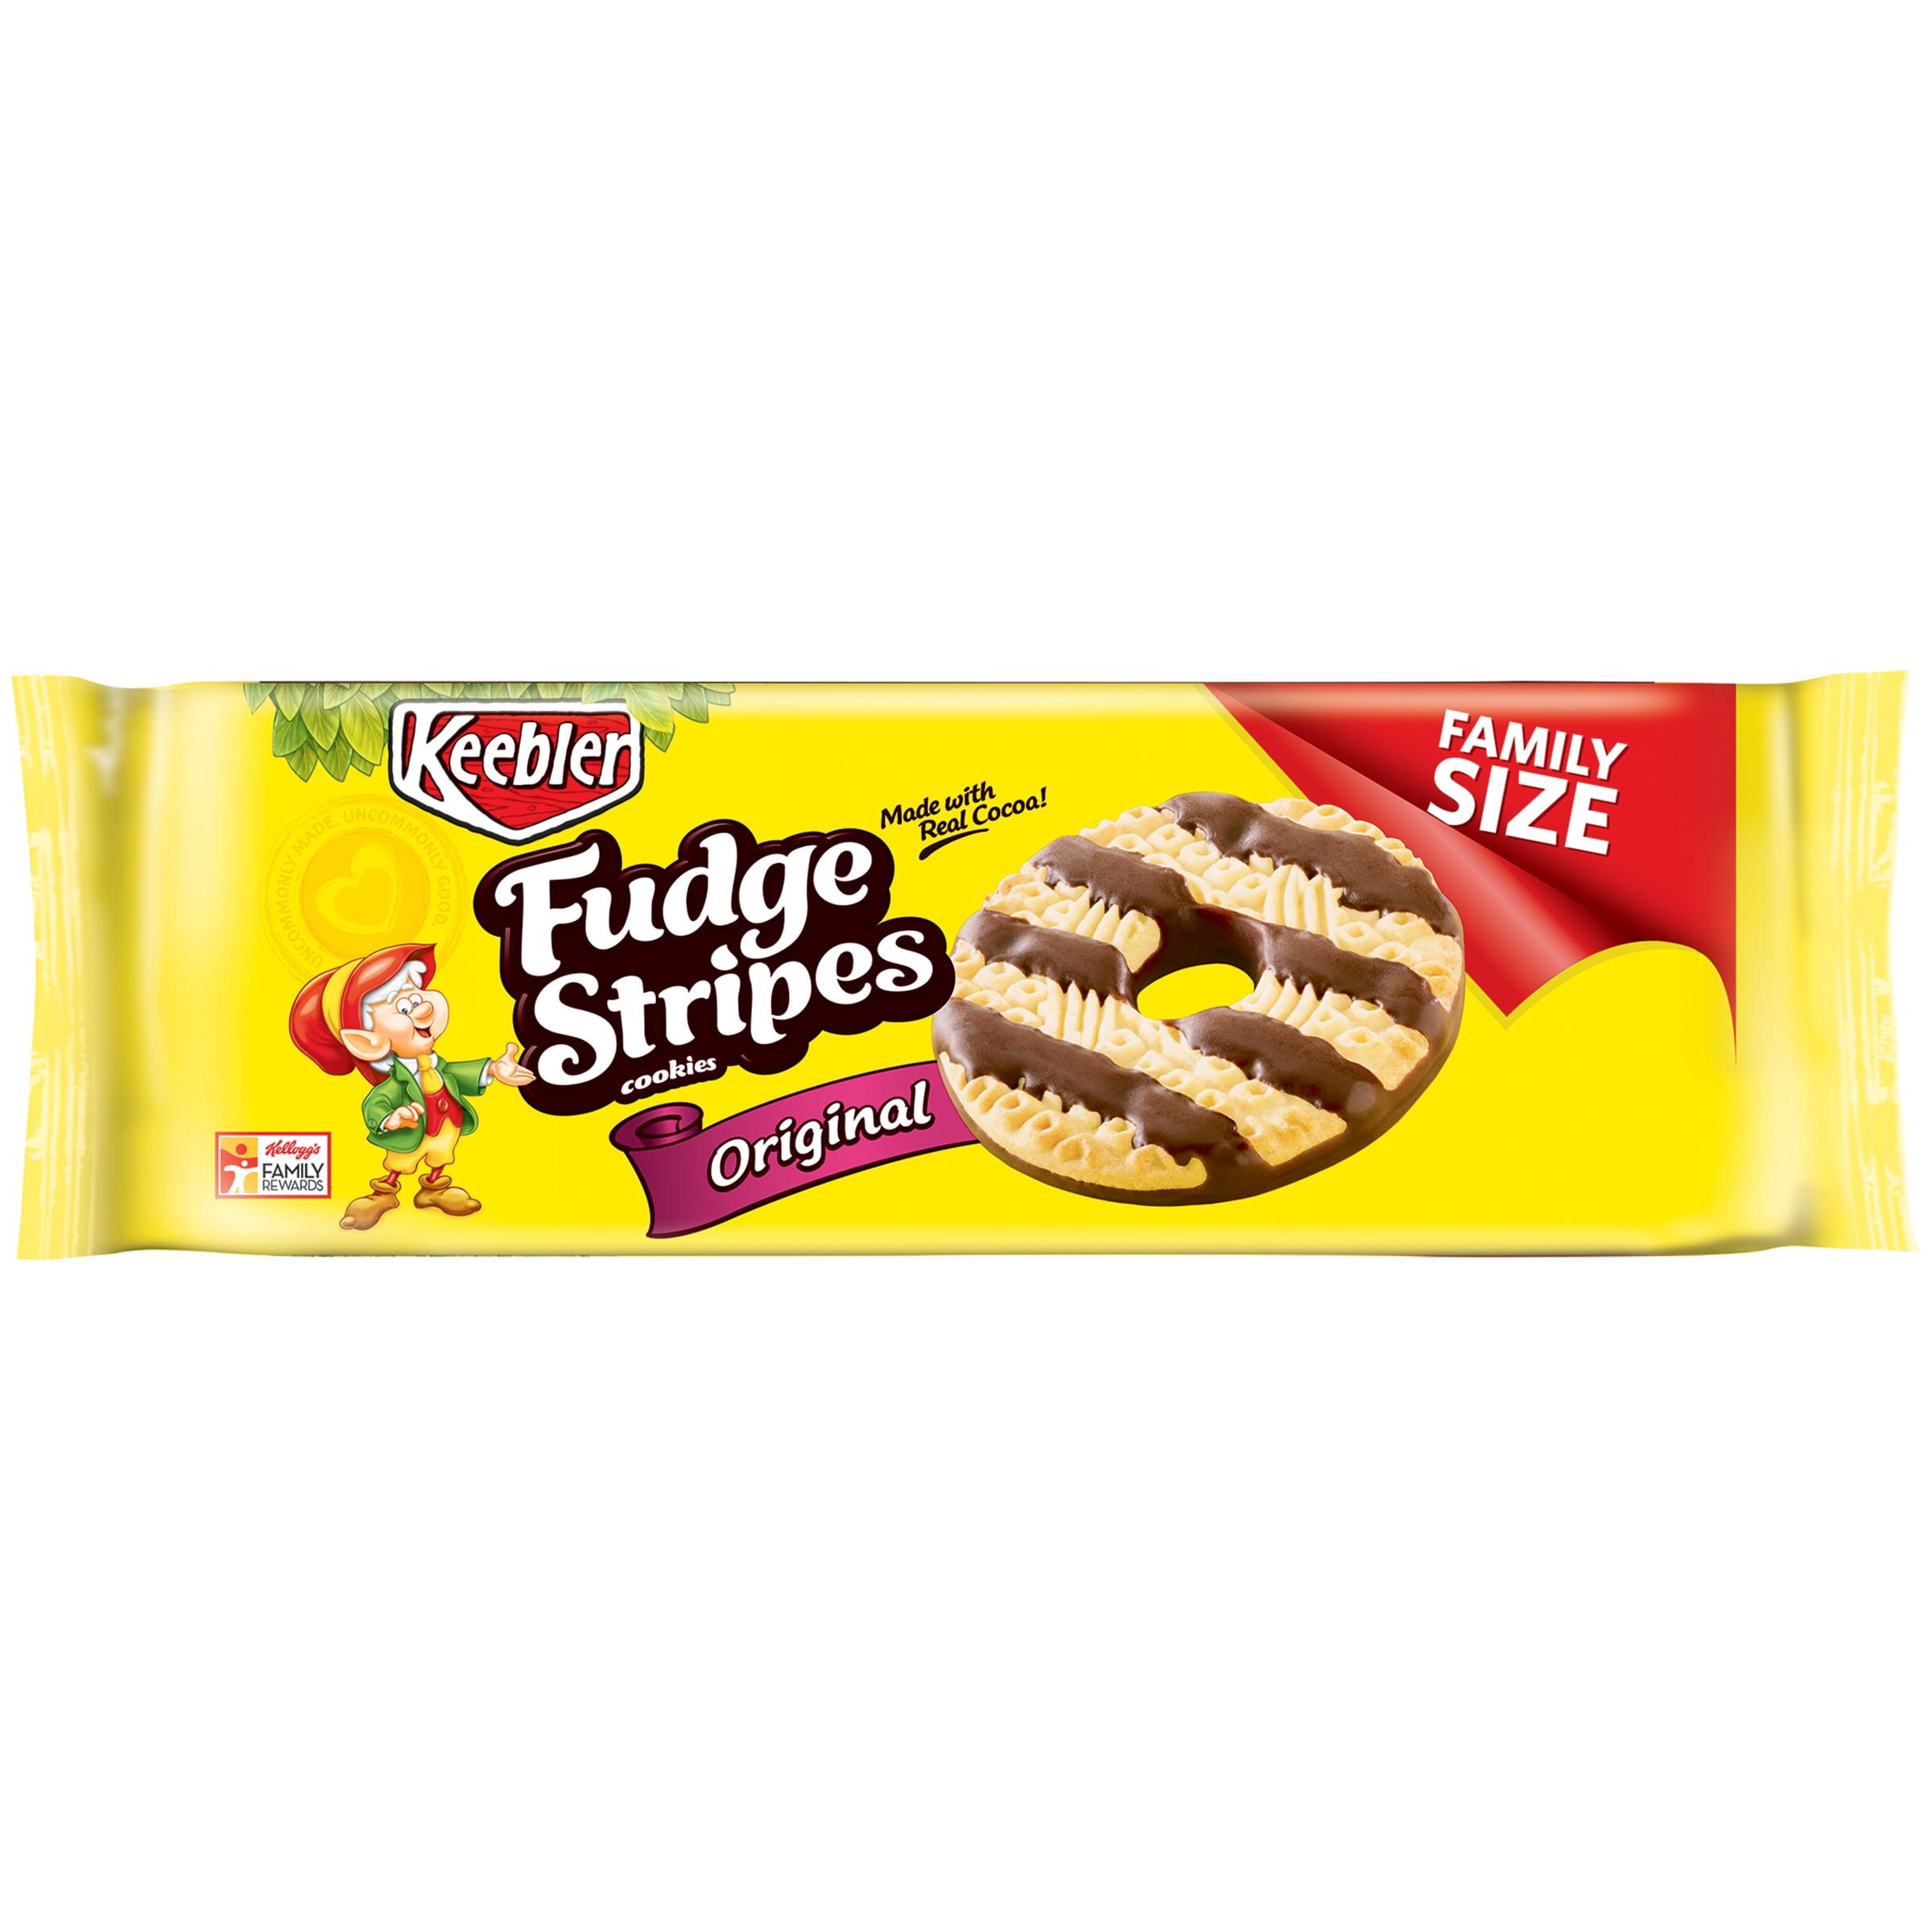 Keebler Fudge Stripes Original Cookies, 17.3 oz